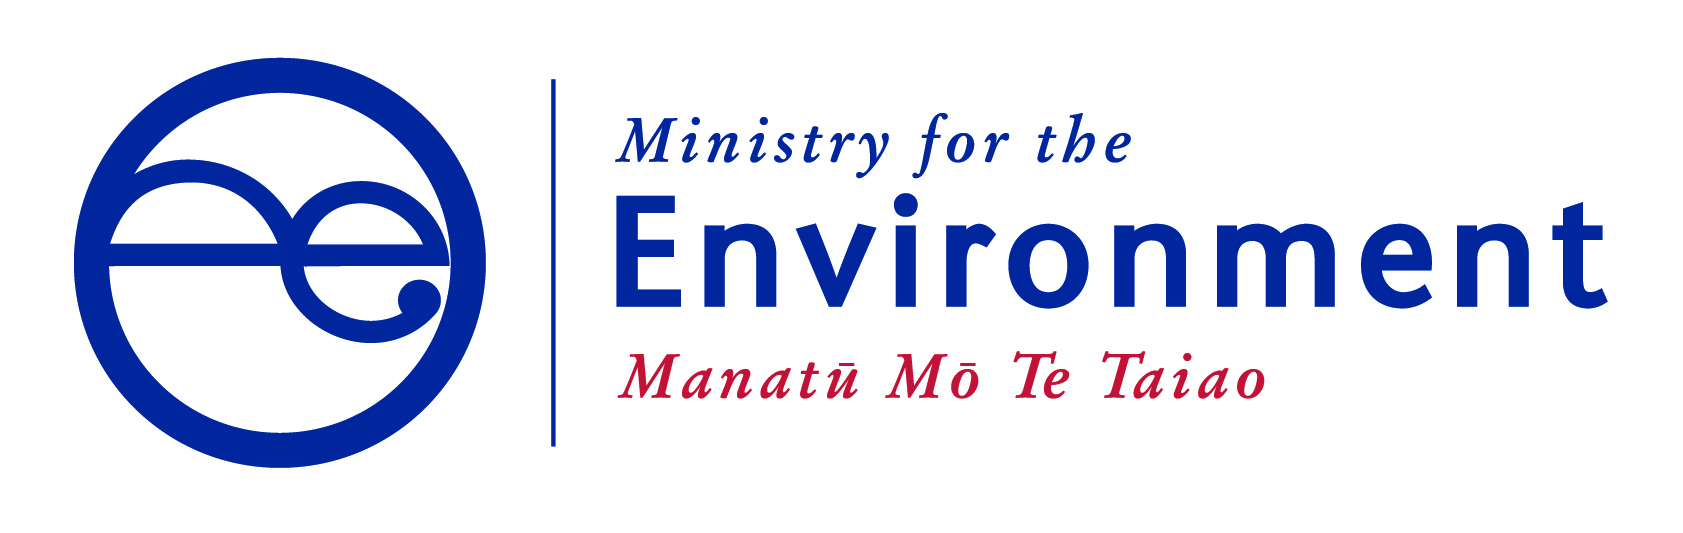 MFE logo CMYK JPEG (002).jpg